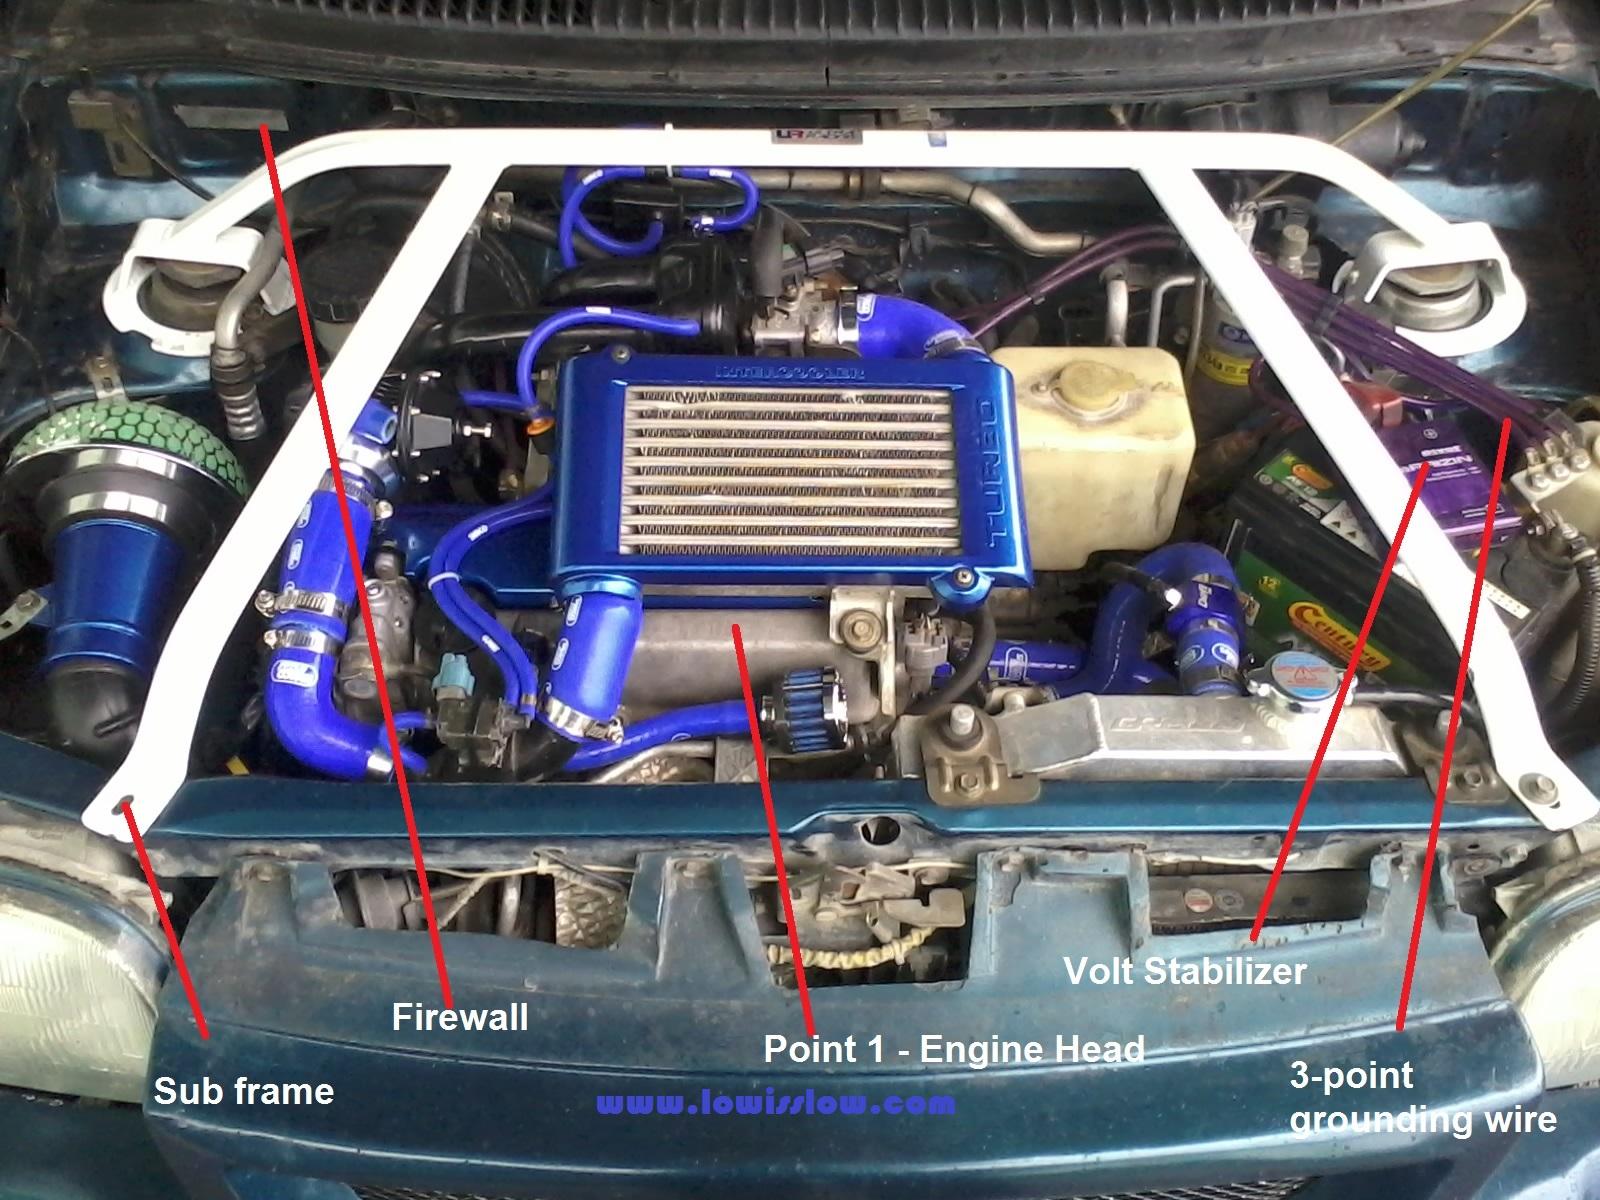 Kancil Aircon Wiring Diagram Residential Electrical Diagrams Perodua Engine Work U2022 How A Car Ac Works